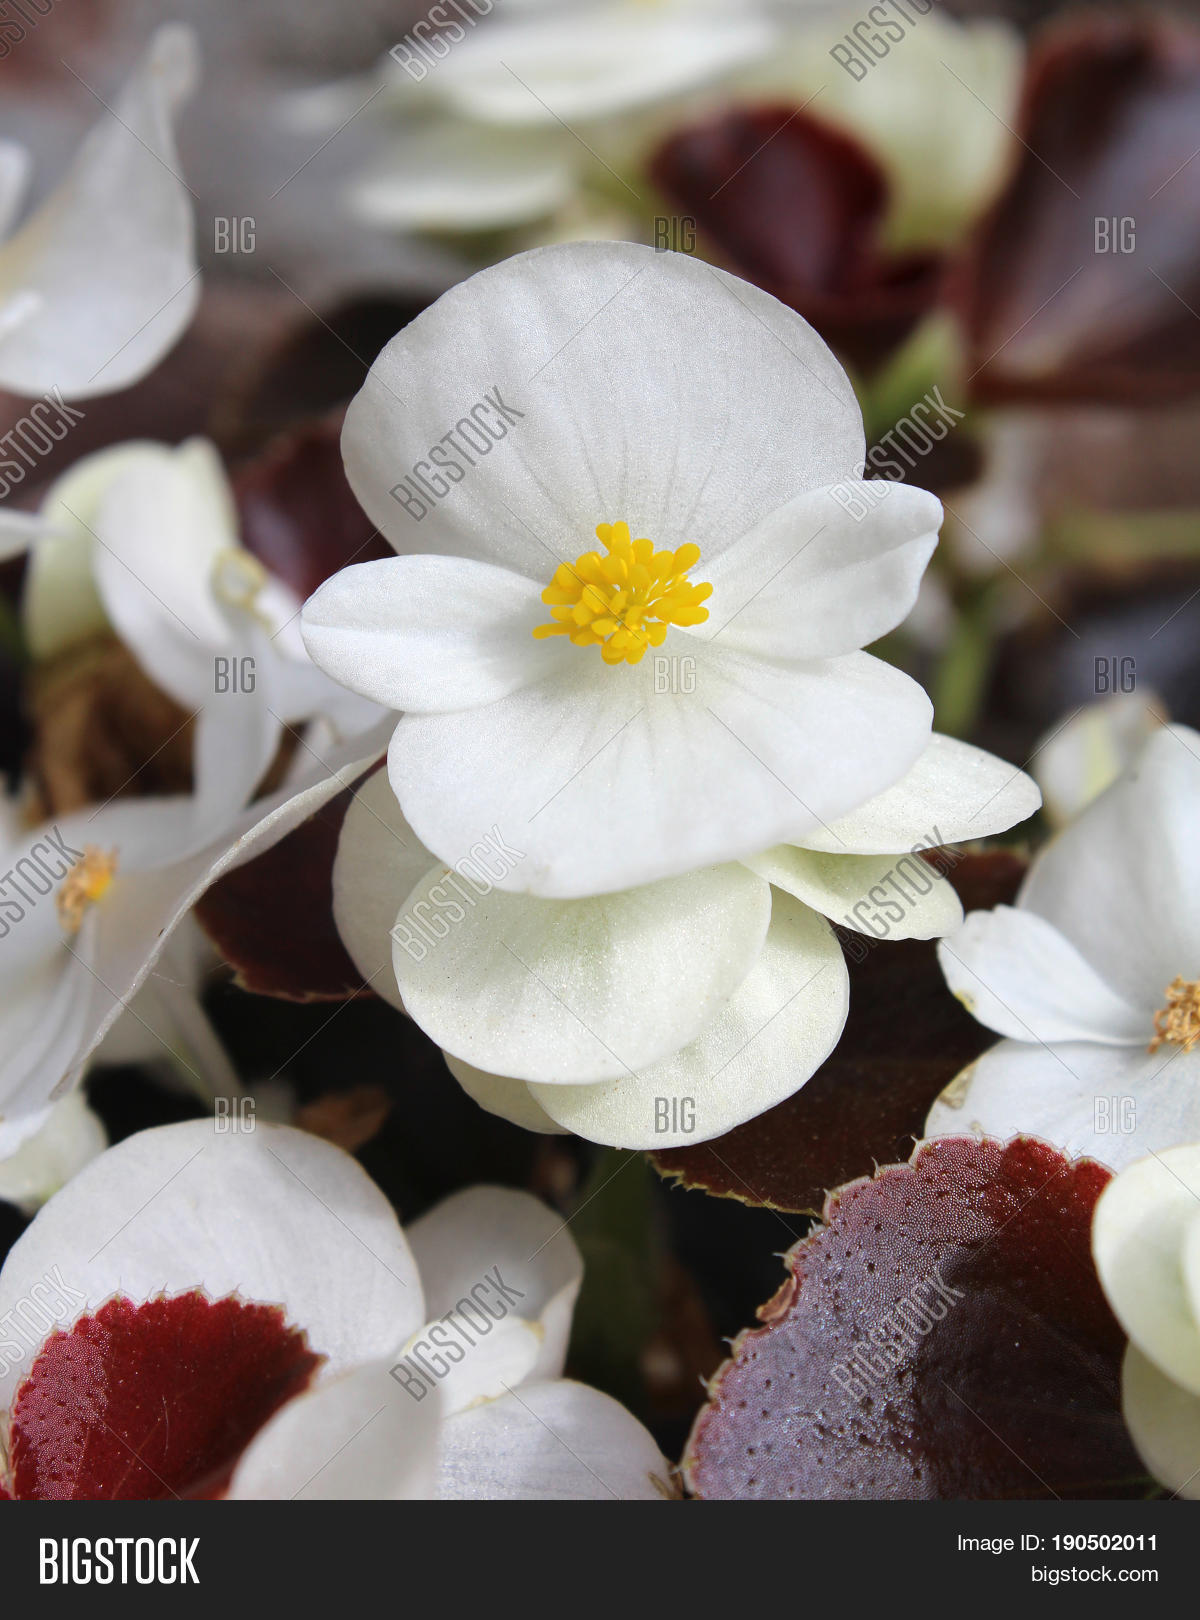 Fresh White Flowers Image Photo Free Trial Bigstock